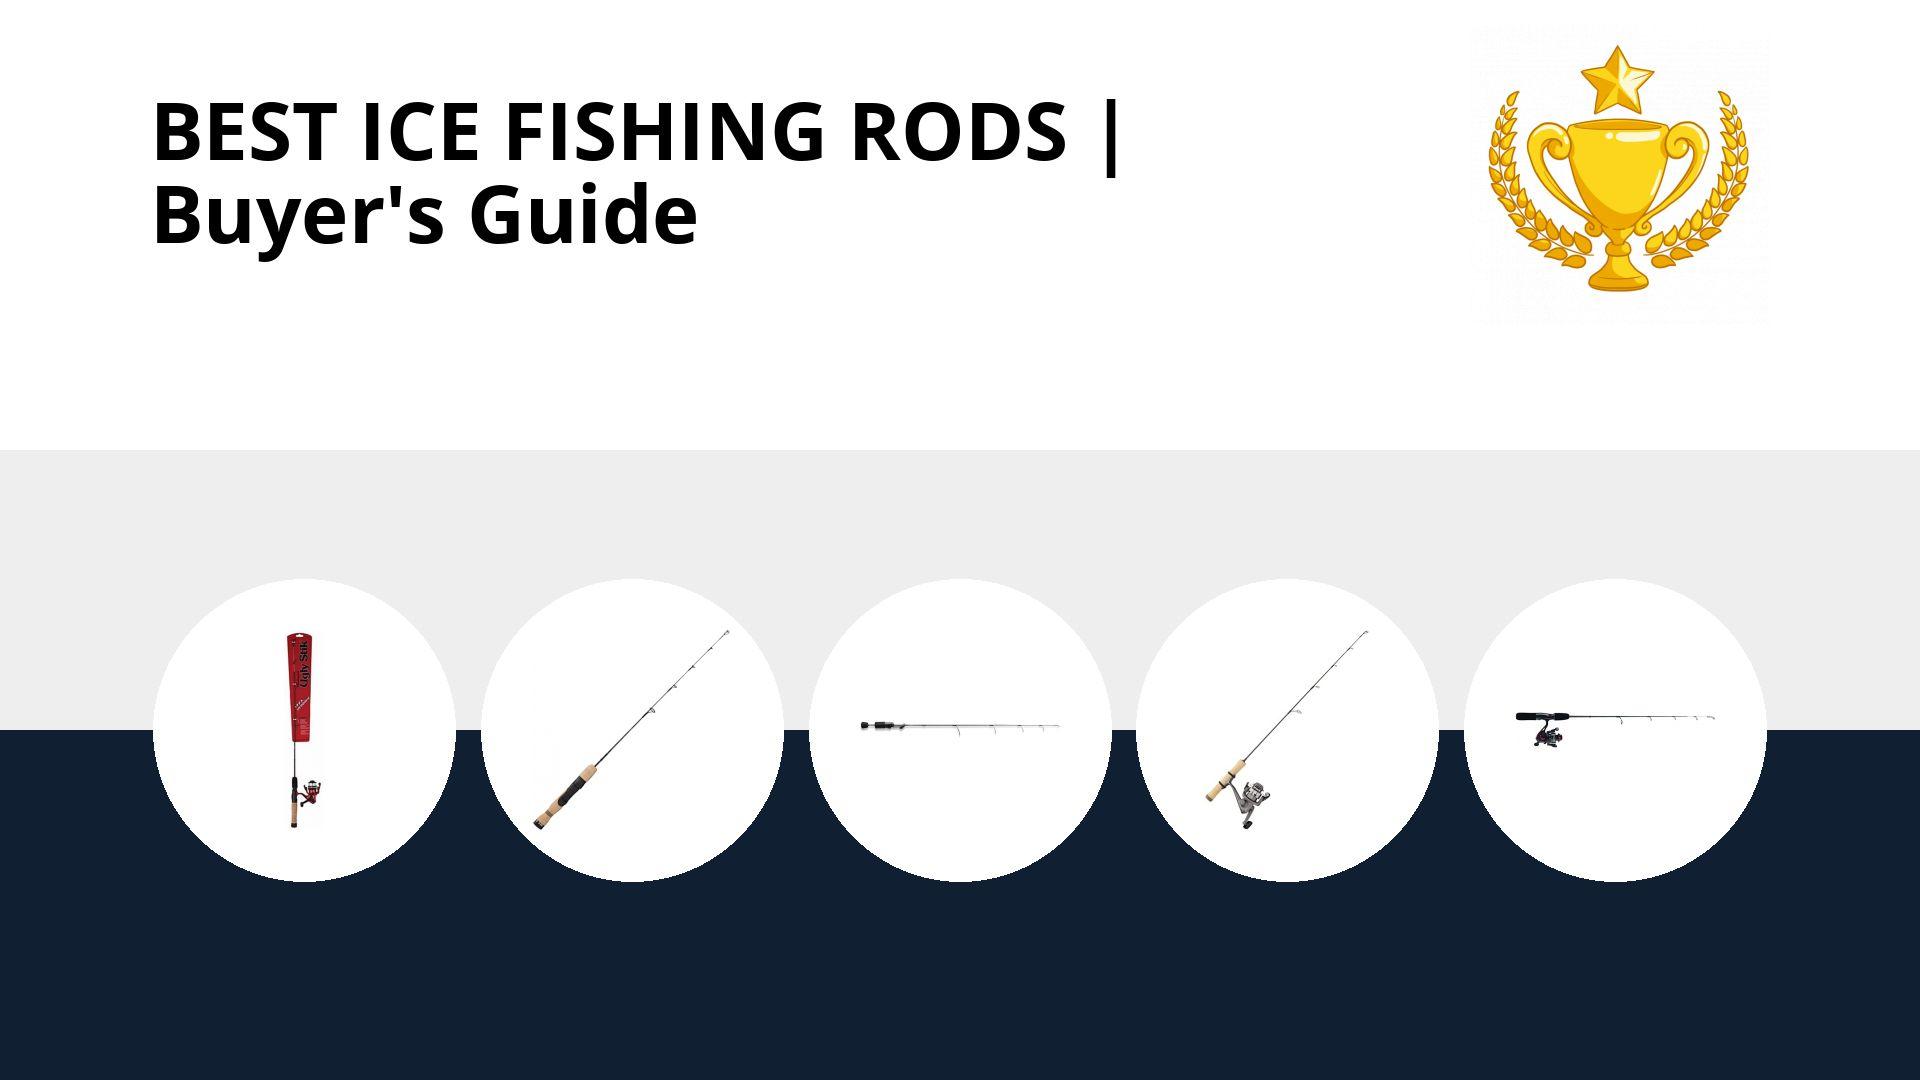 Best Ice Fishing Rods: image